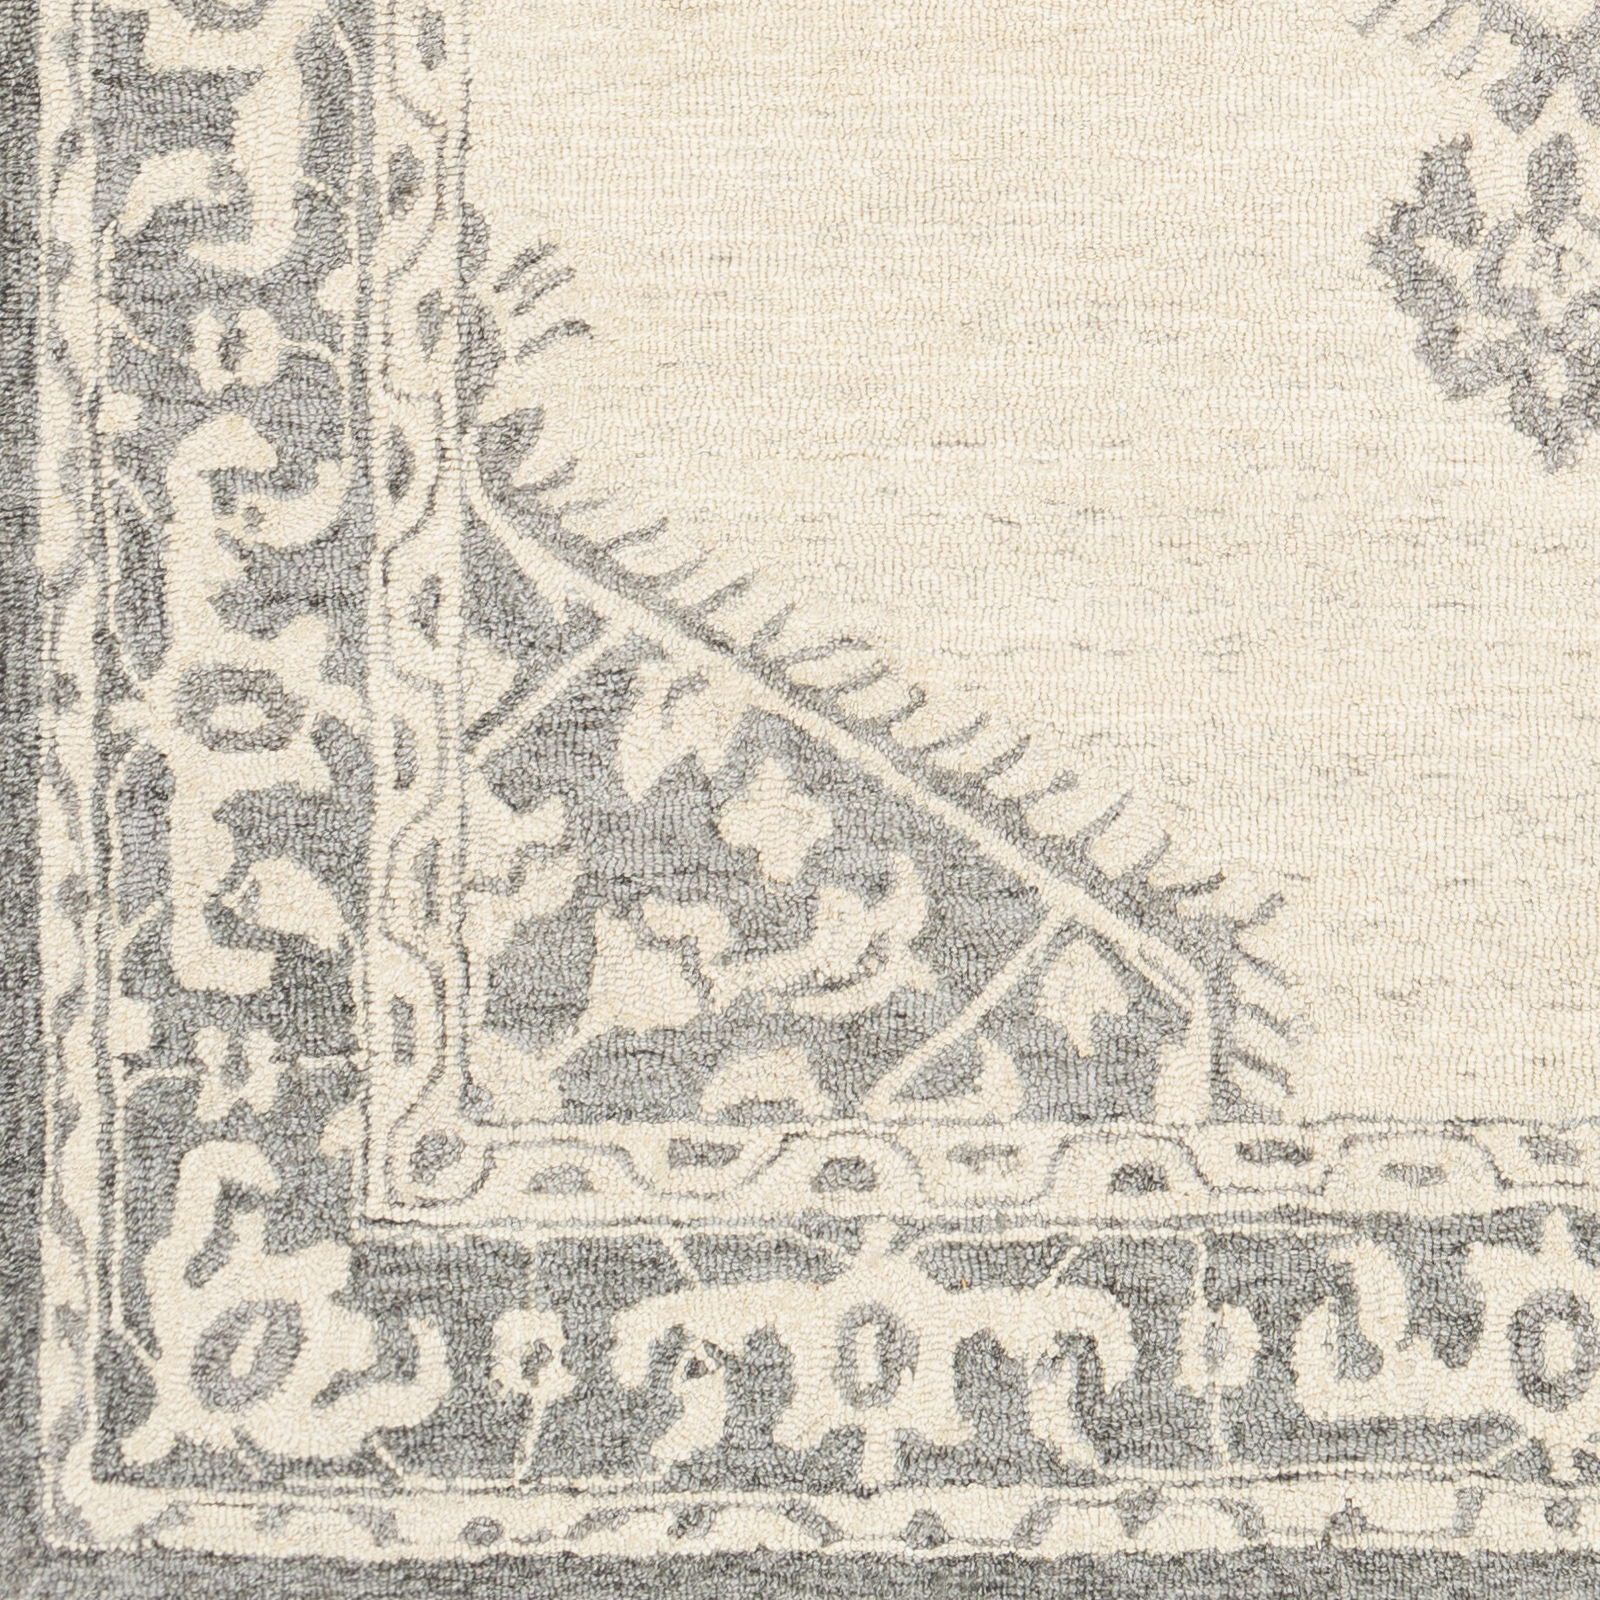 Granada - GND-2307 - 2' x 3'